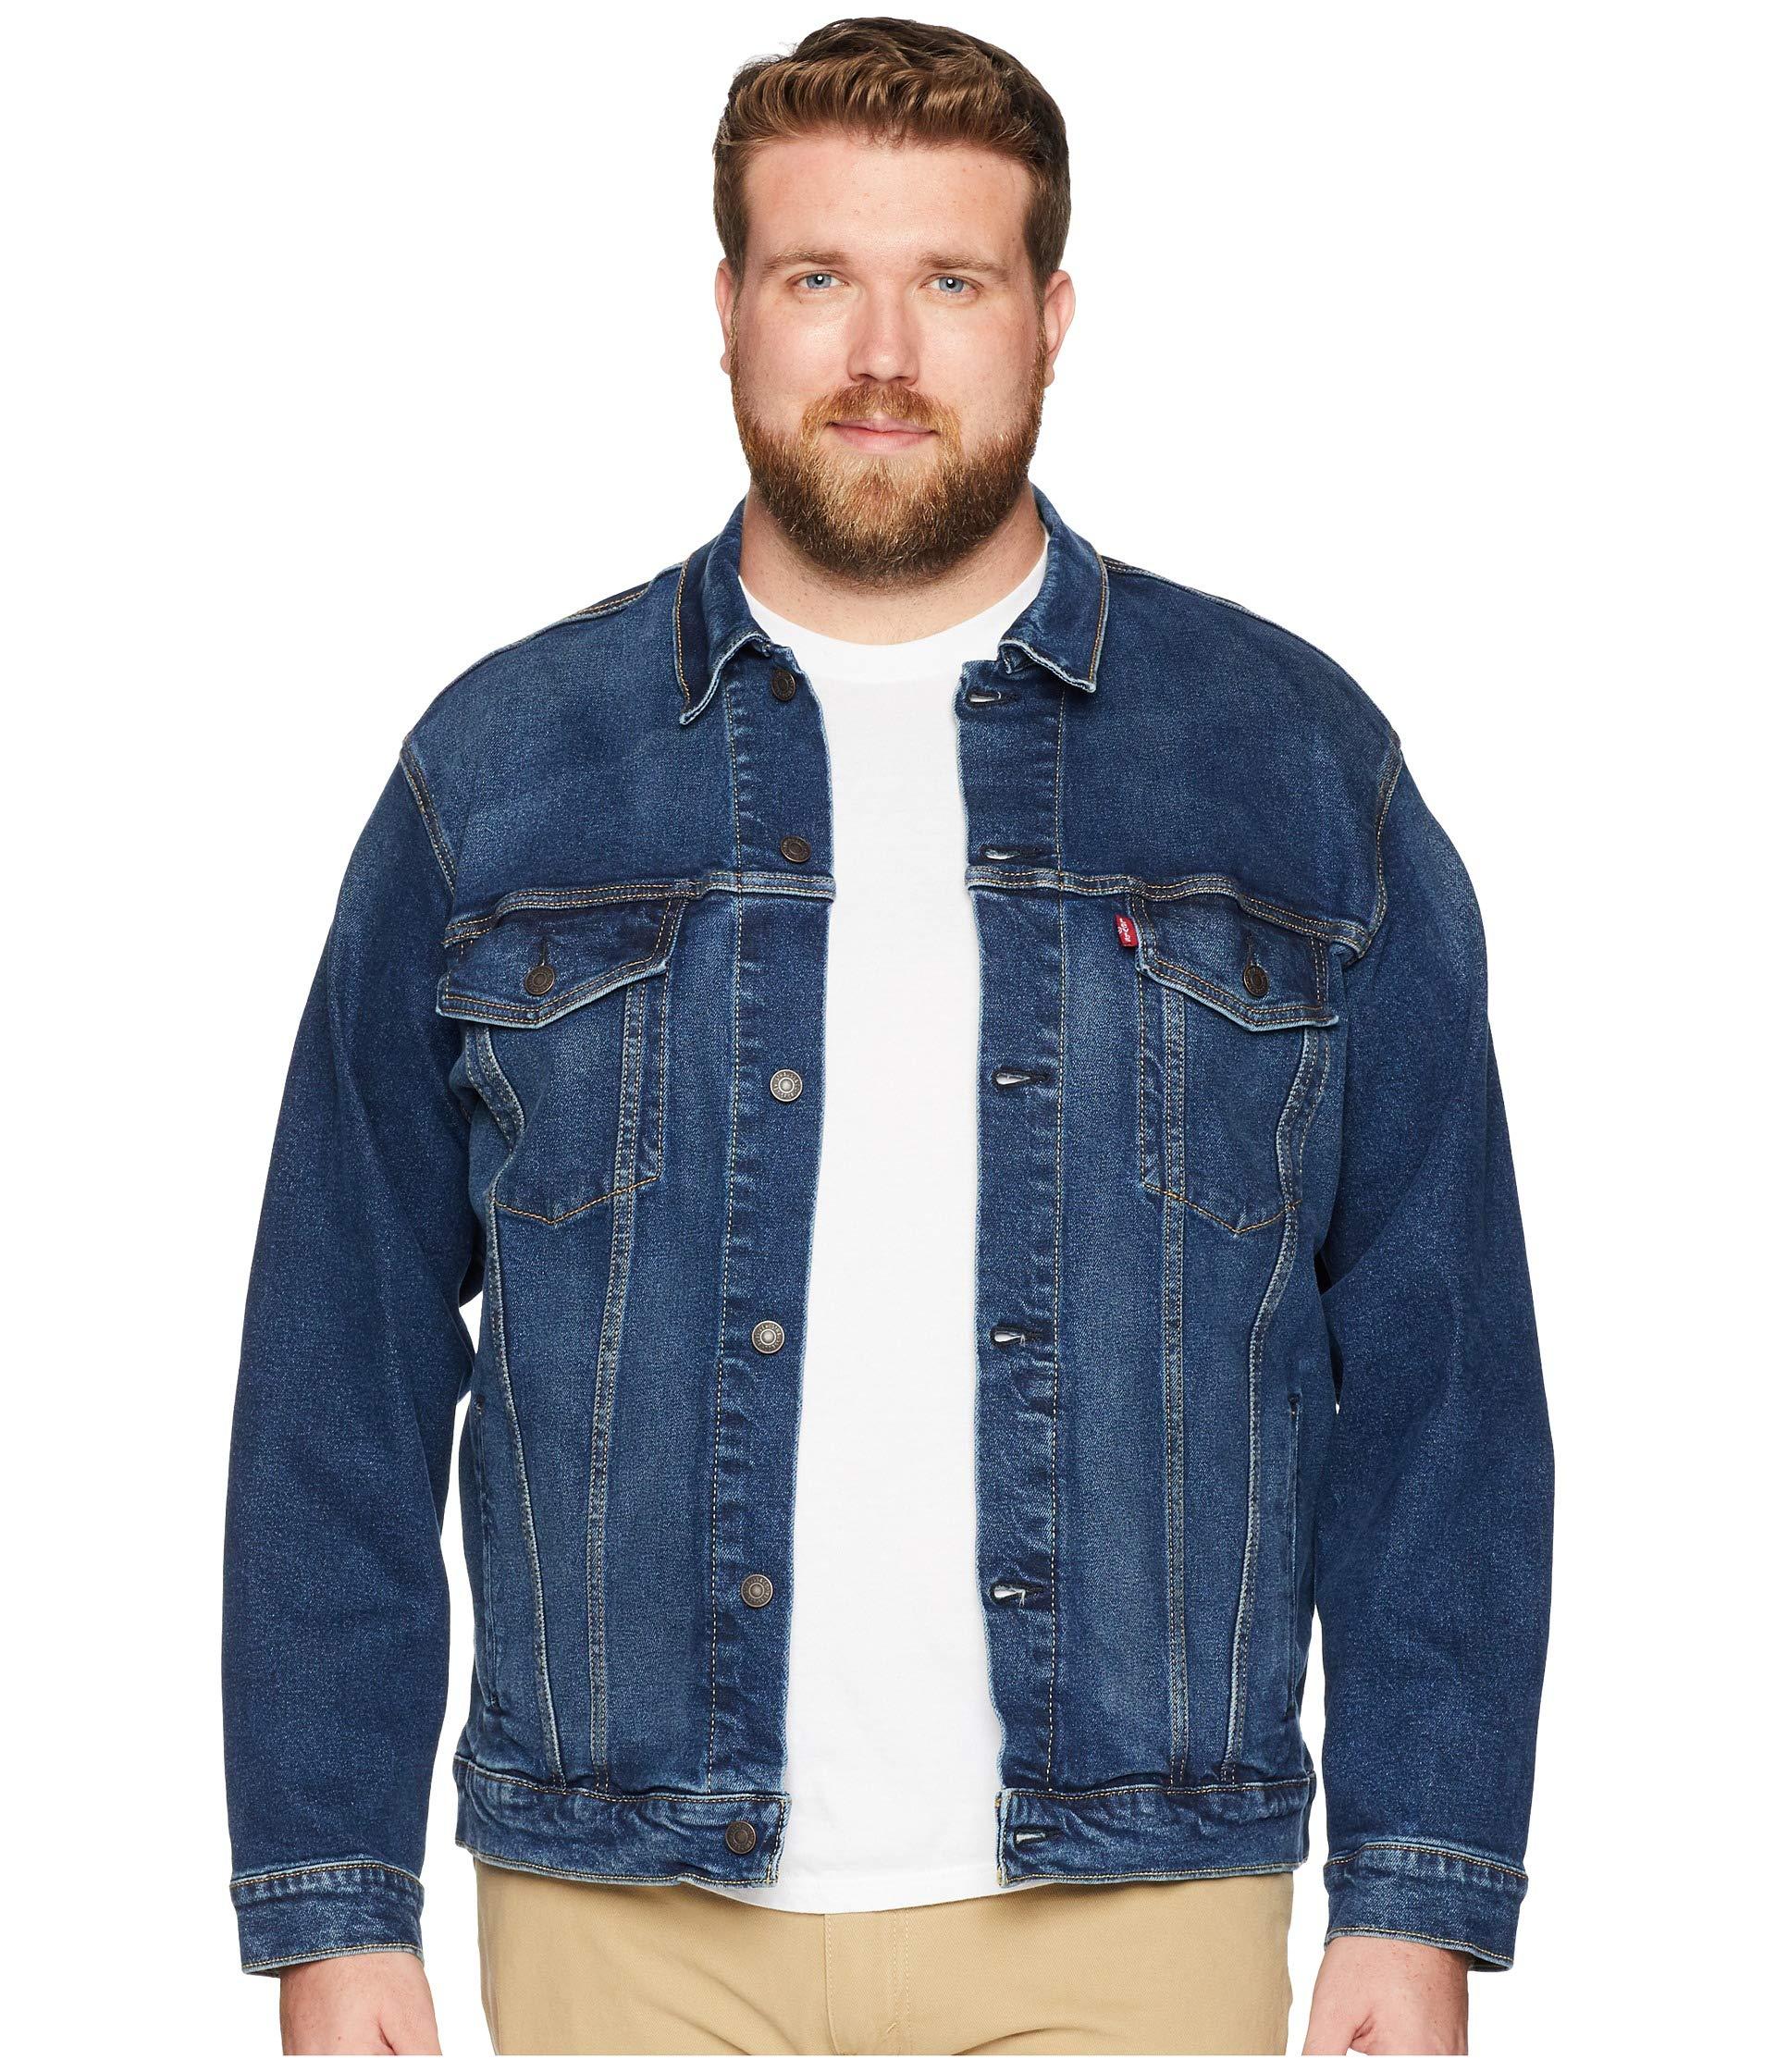 Levi's Men's Big and Tall Trucker Jacket, Colusa/Stretch, 3XL